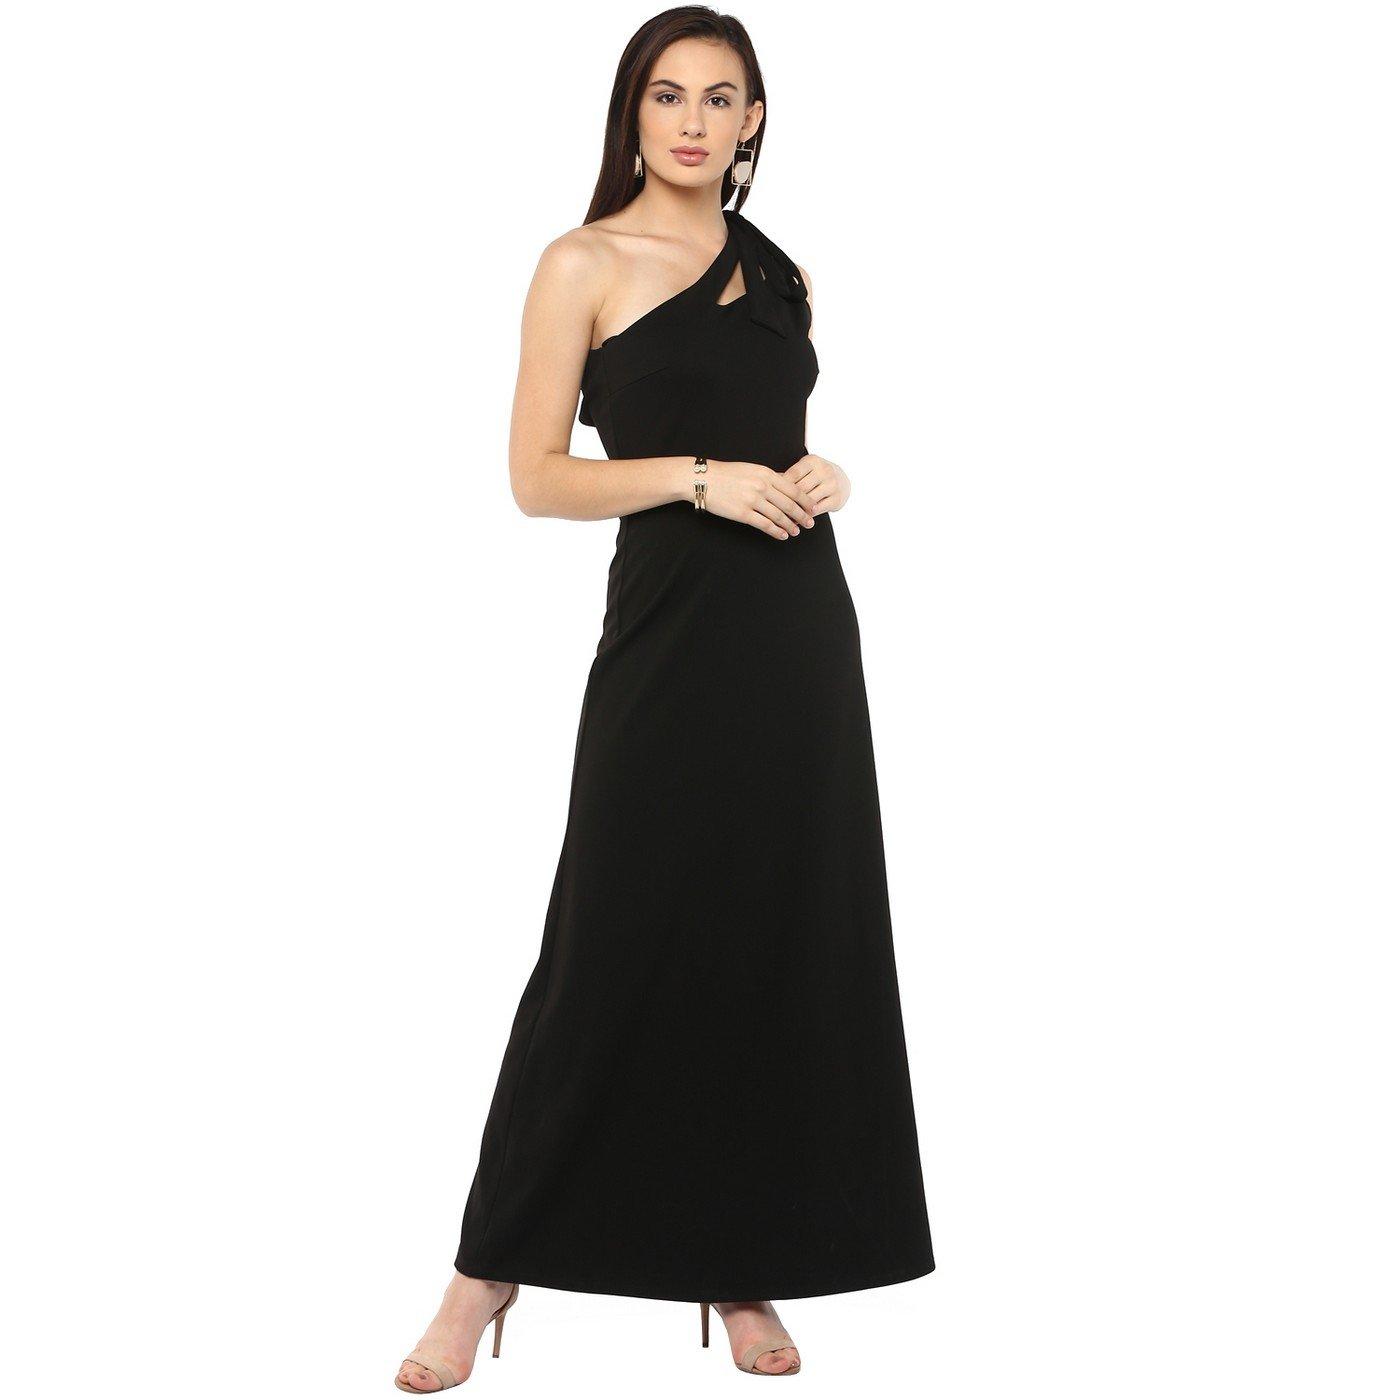 79e0646e1051d Kazo Women's One-Shoulder Maxi Dress: Amazon.in: Clothing & Accessories